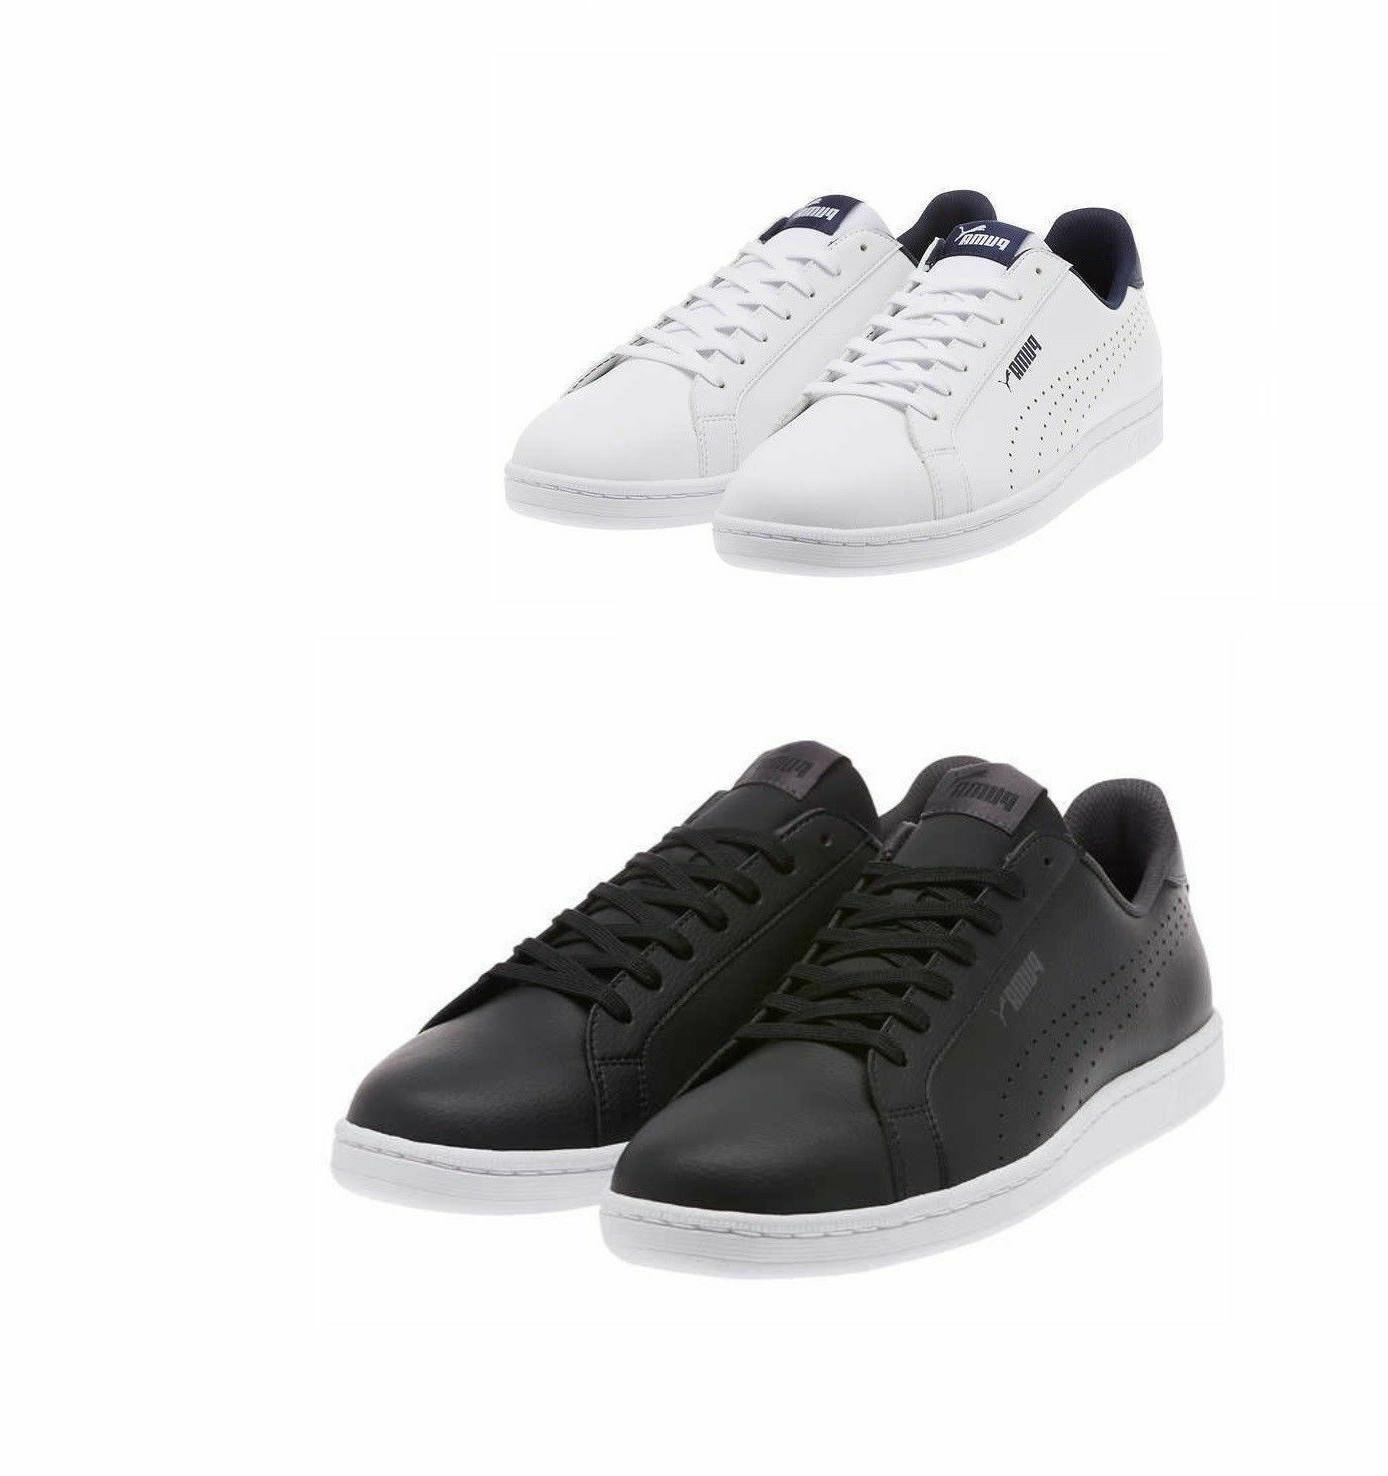 NEW!!! PUMA Men's Smash Perf Met Athletic Tennis Shoes Color